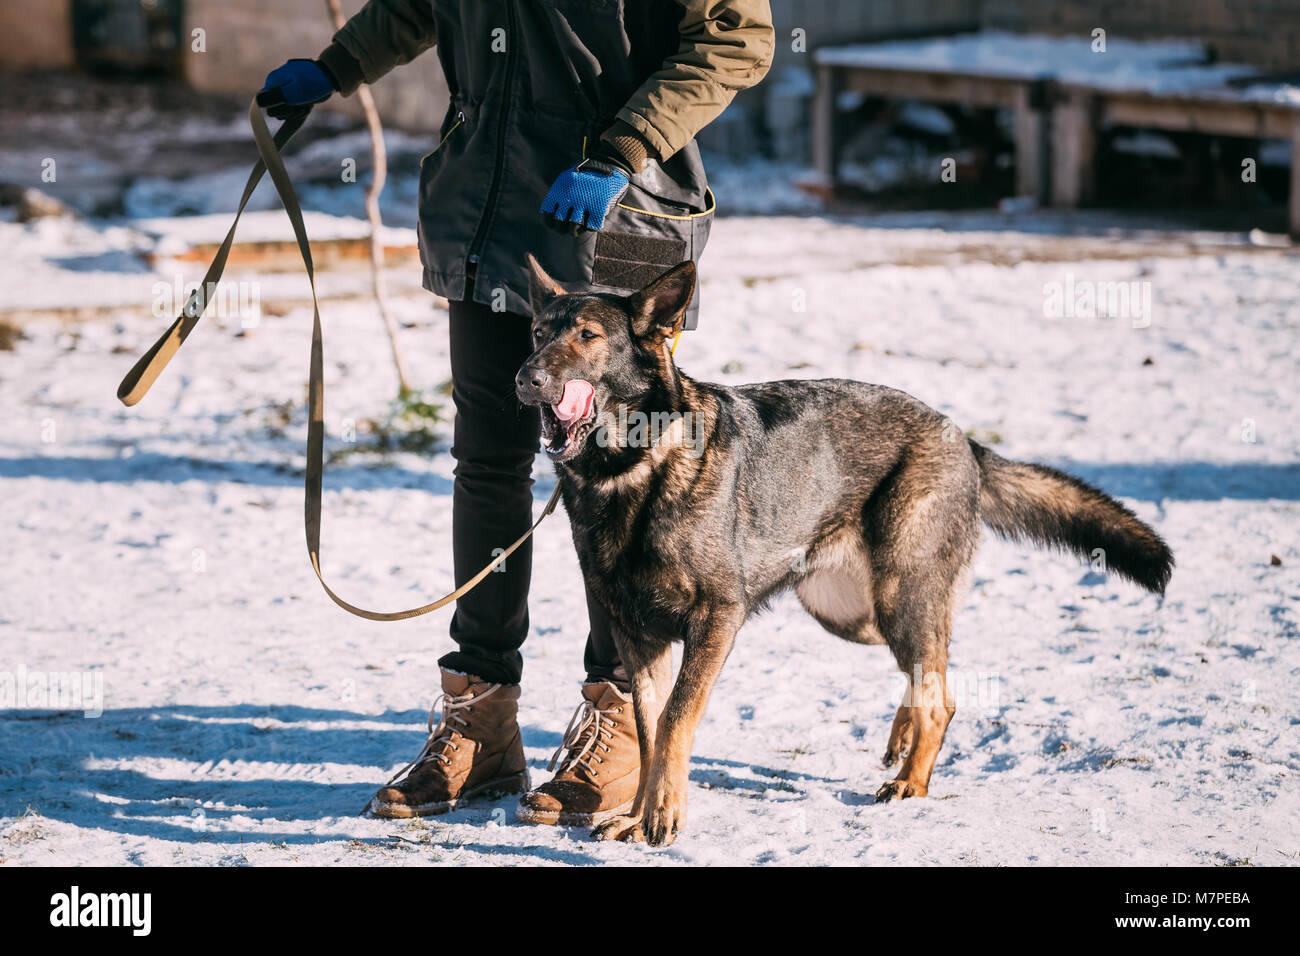 German Shepherd Dog Near Owner During Training. Winter Season. Training Of Purebred Adult Alsatian Wolf Dog - Stock Image